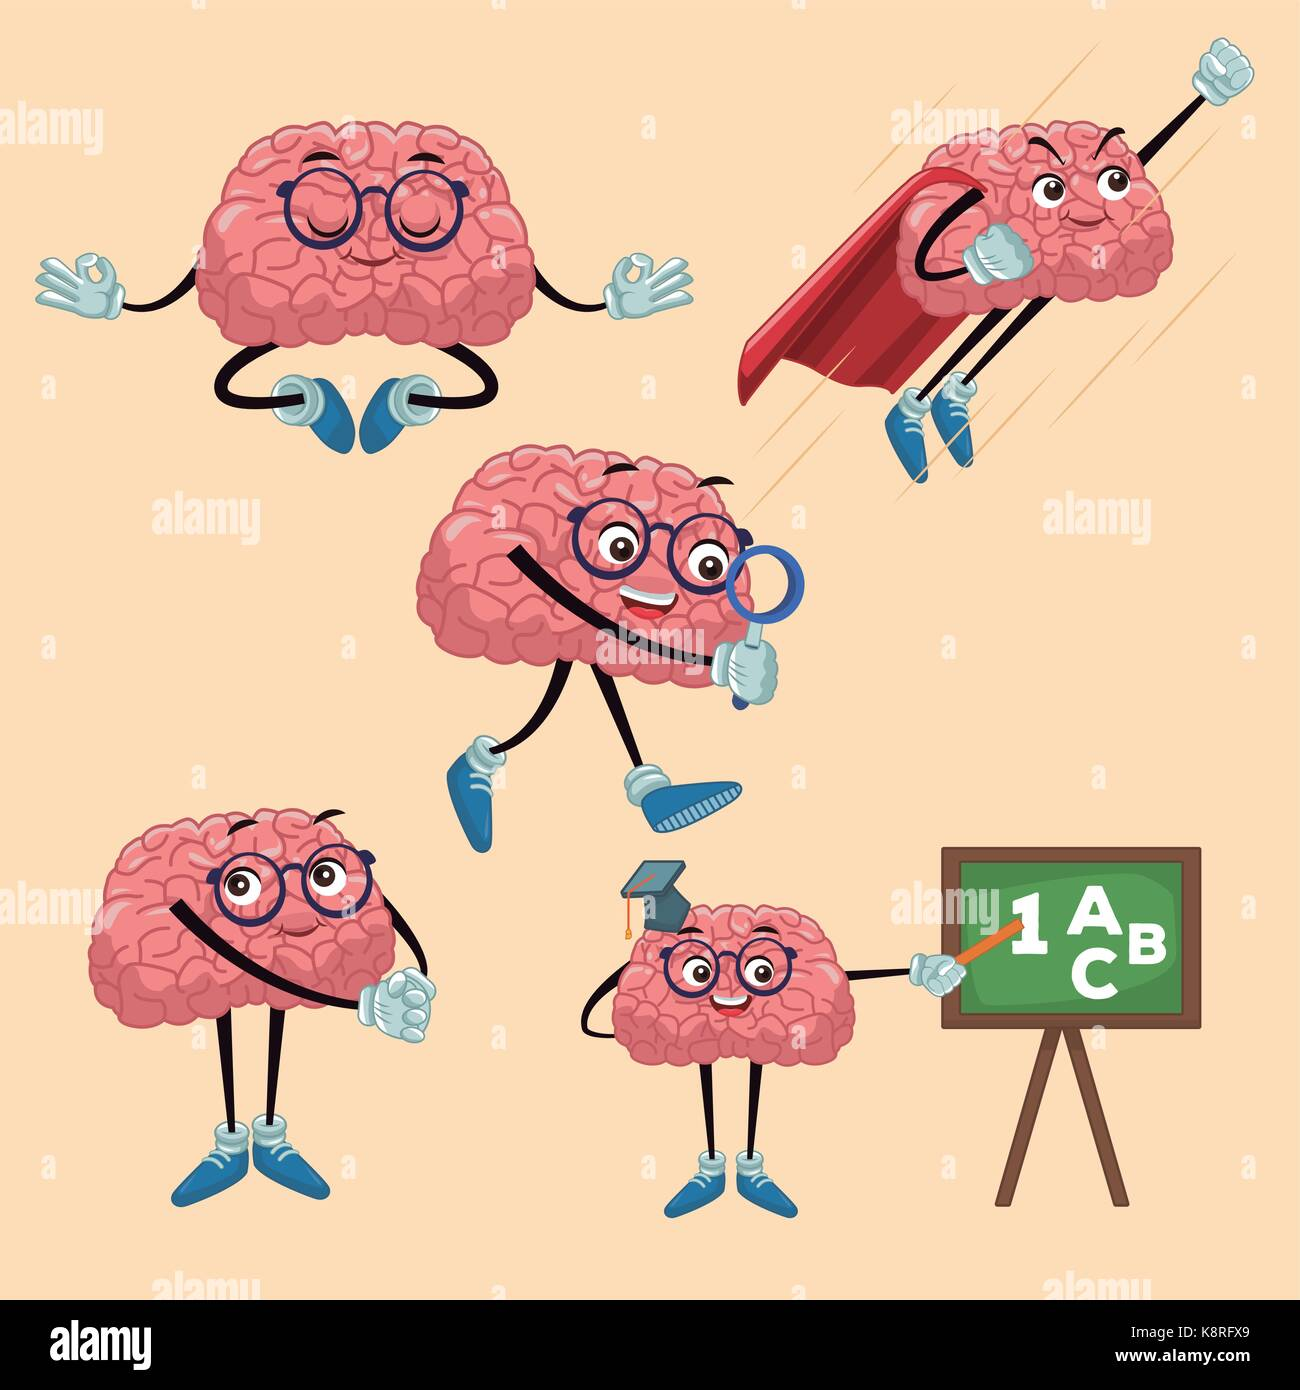 Cute brains cartoons - Stock Image